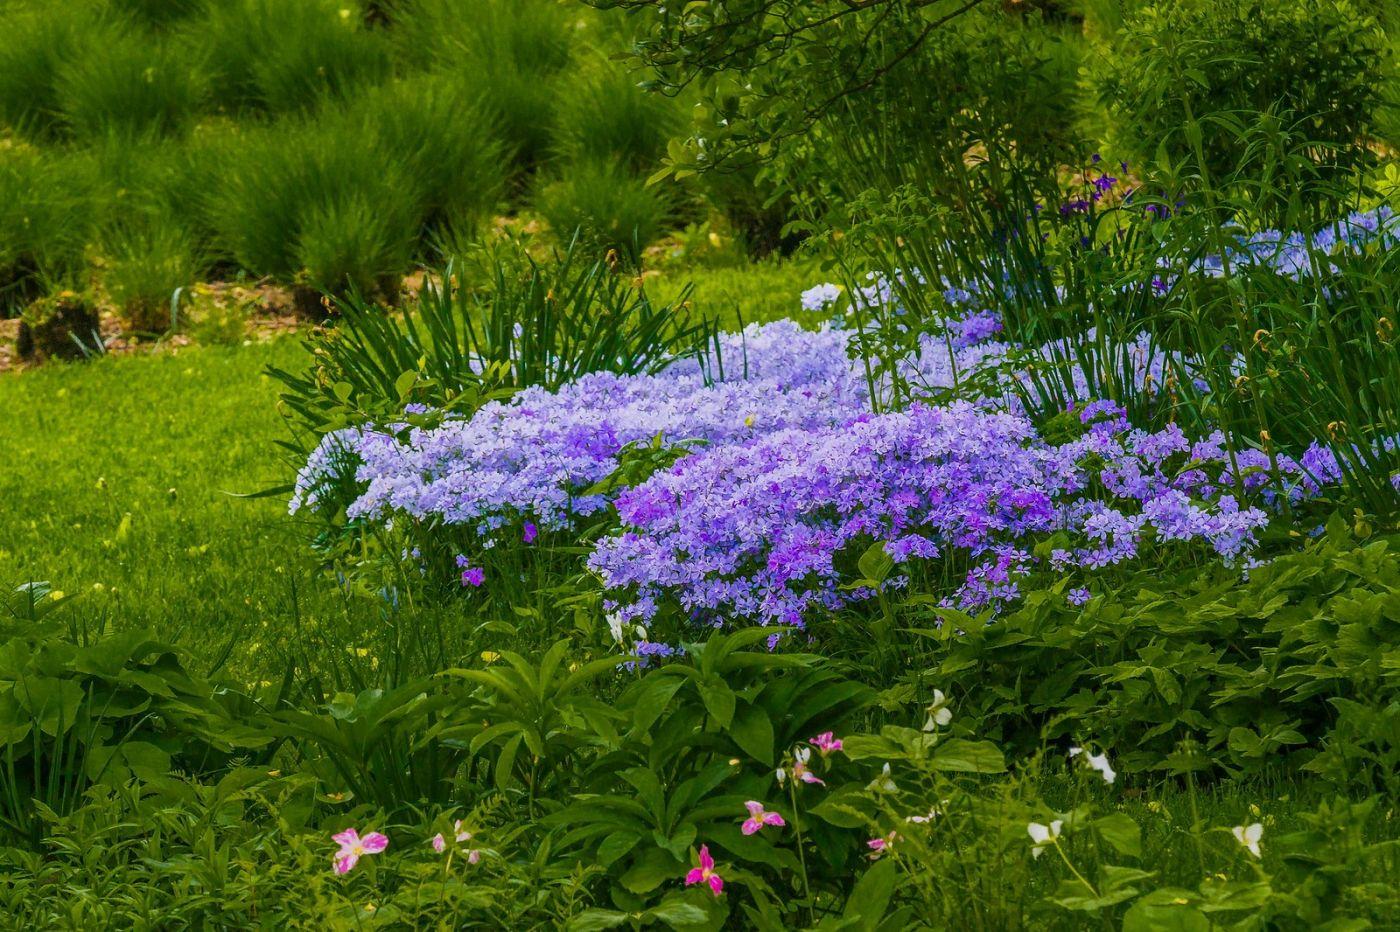 Chanticleer花园,有梦想的季节_图1-9